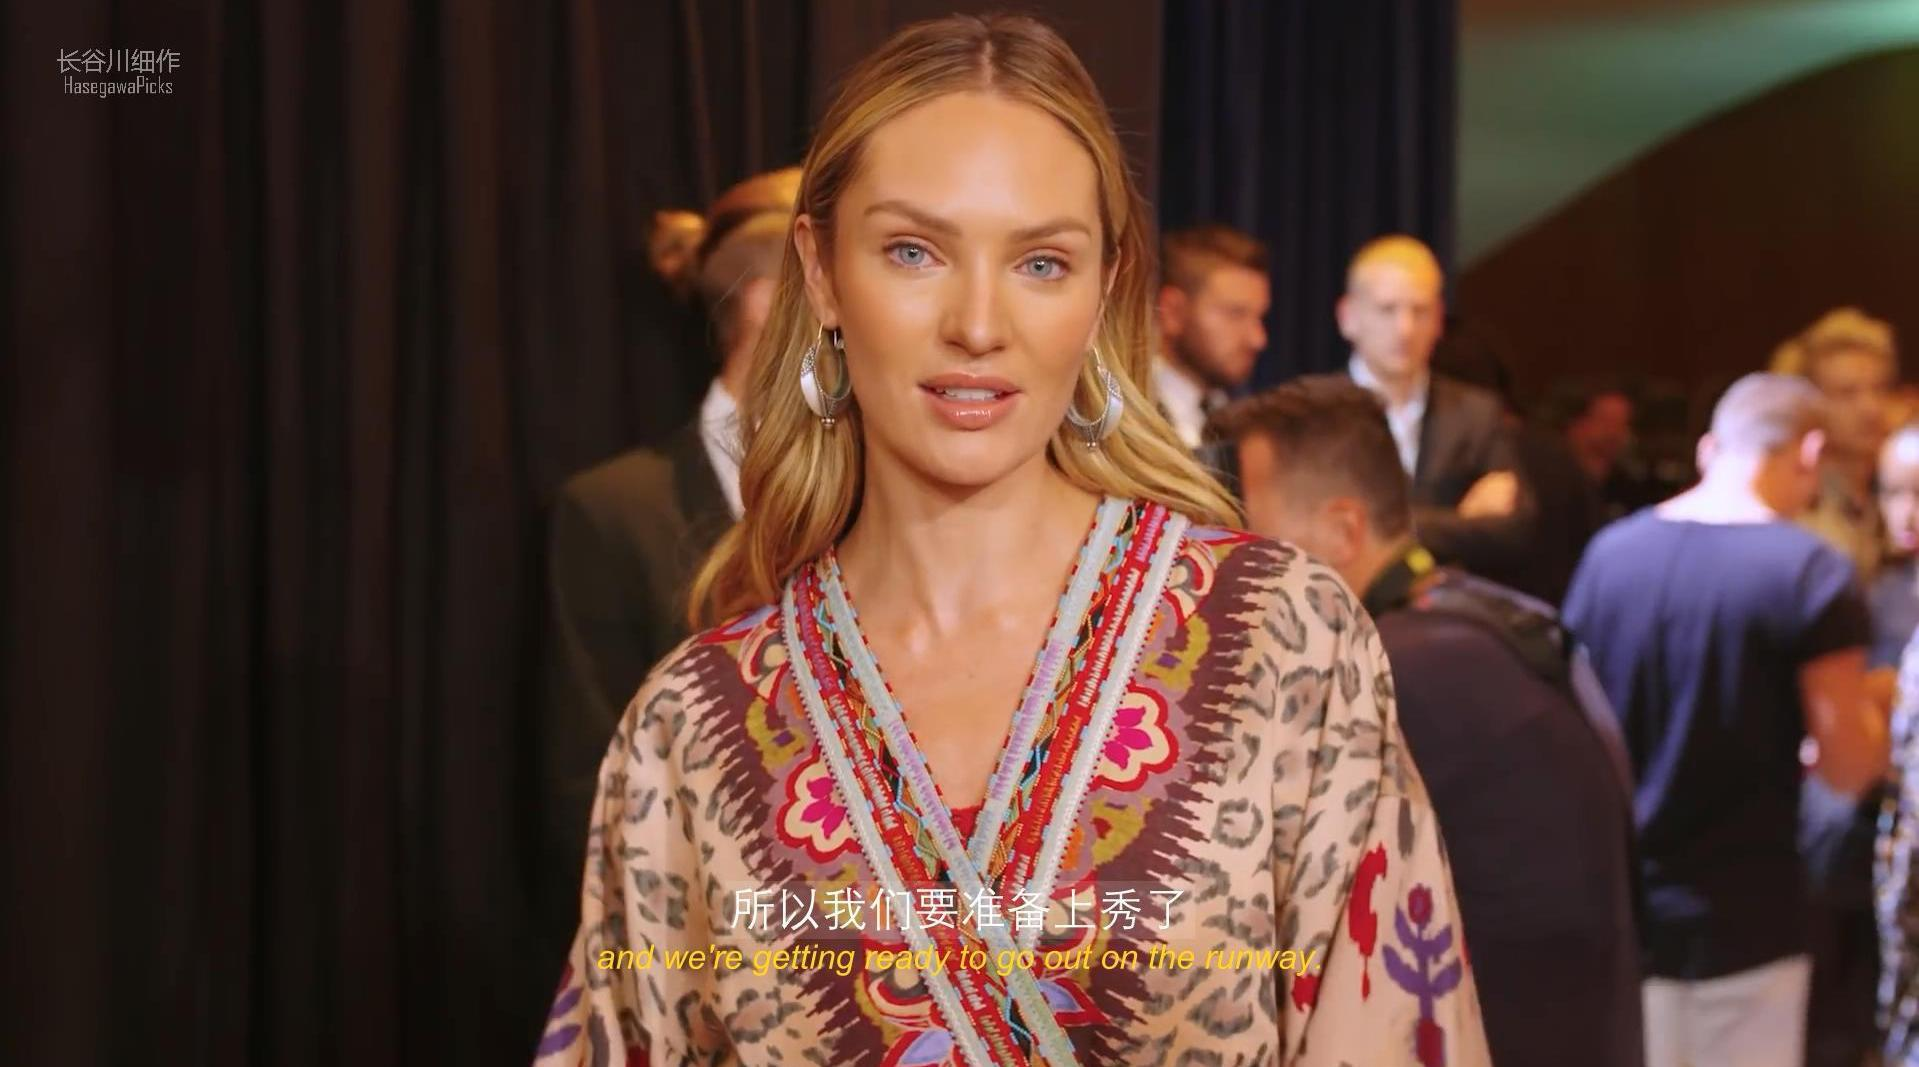 「字幕」Vogue 跟拍超模 Candice Swanepoel 的米兰时装周走秀日